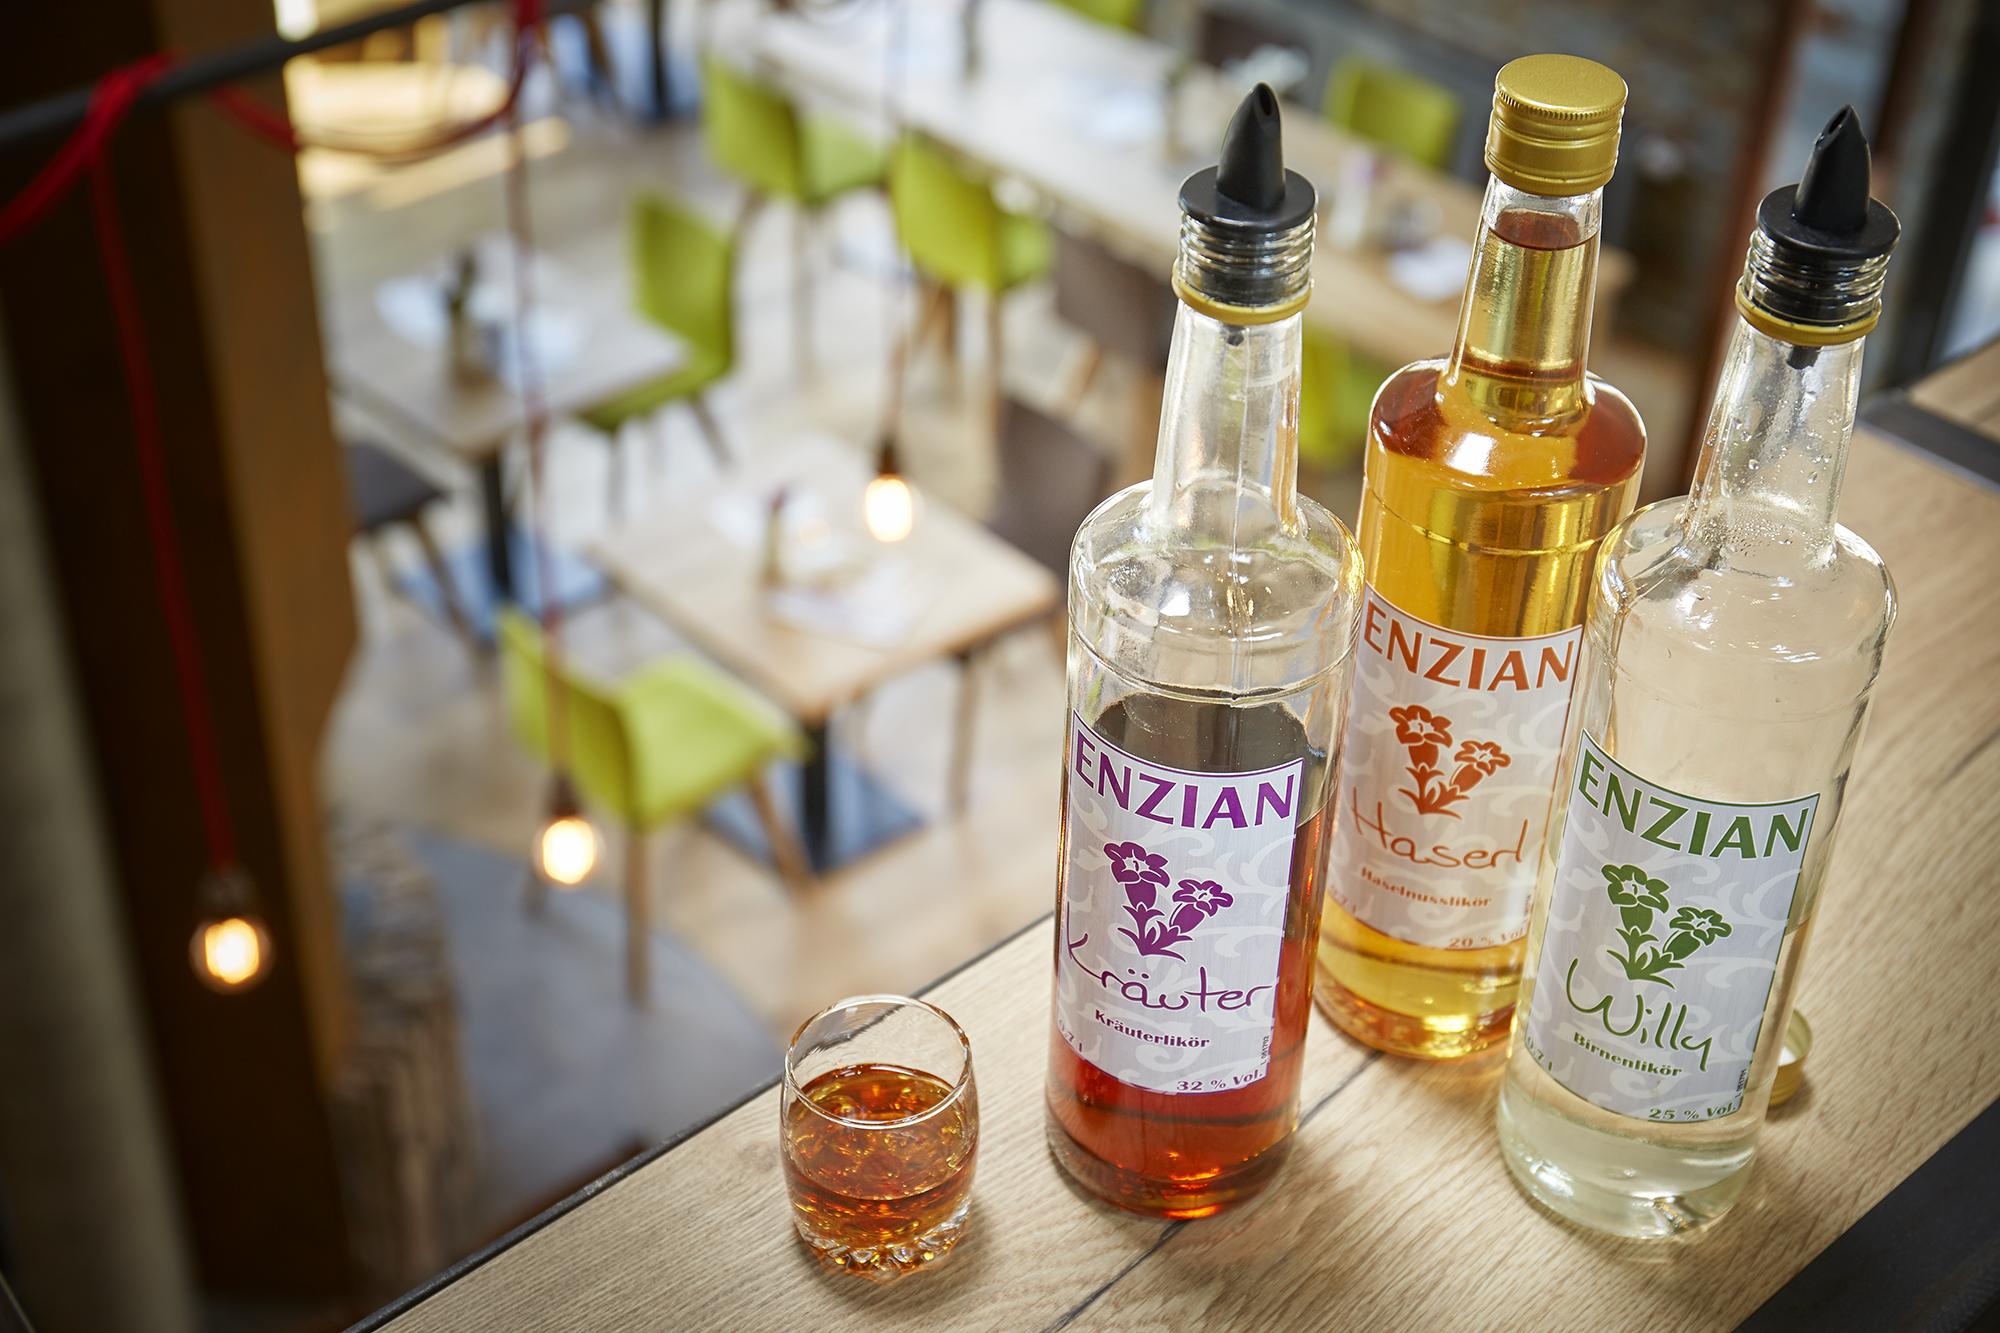 Enzian_X_Drinks_03 Enzian Schnaps